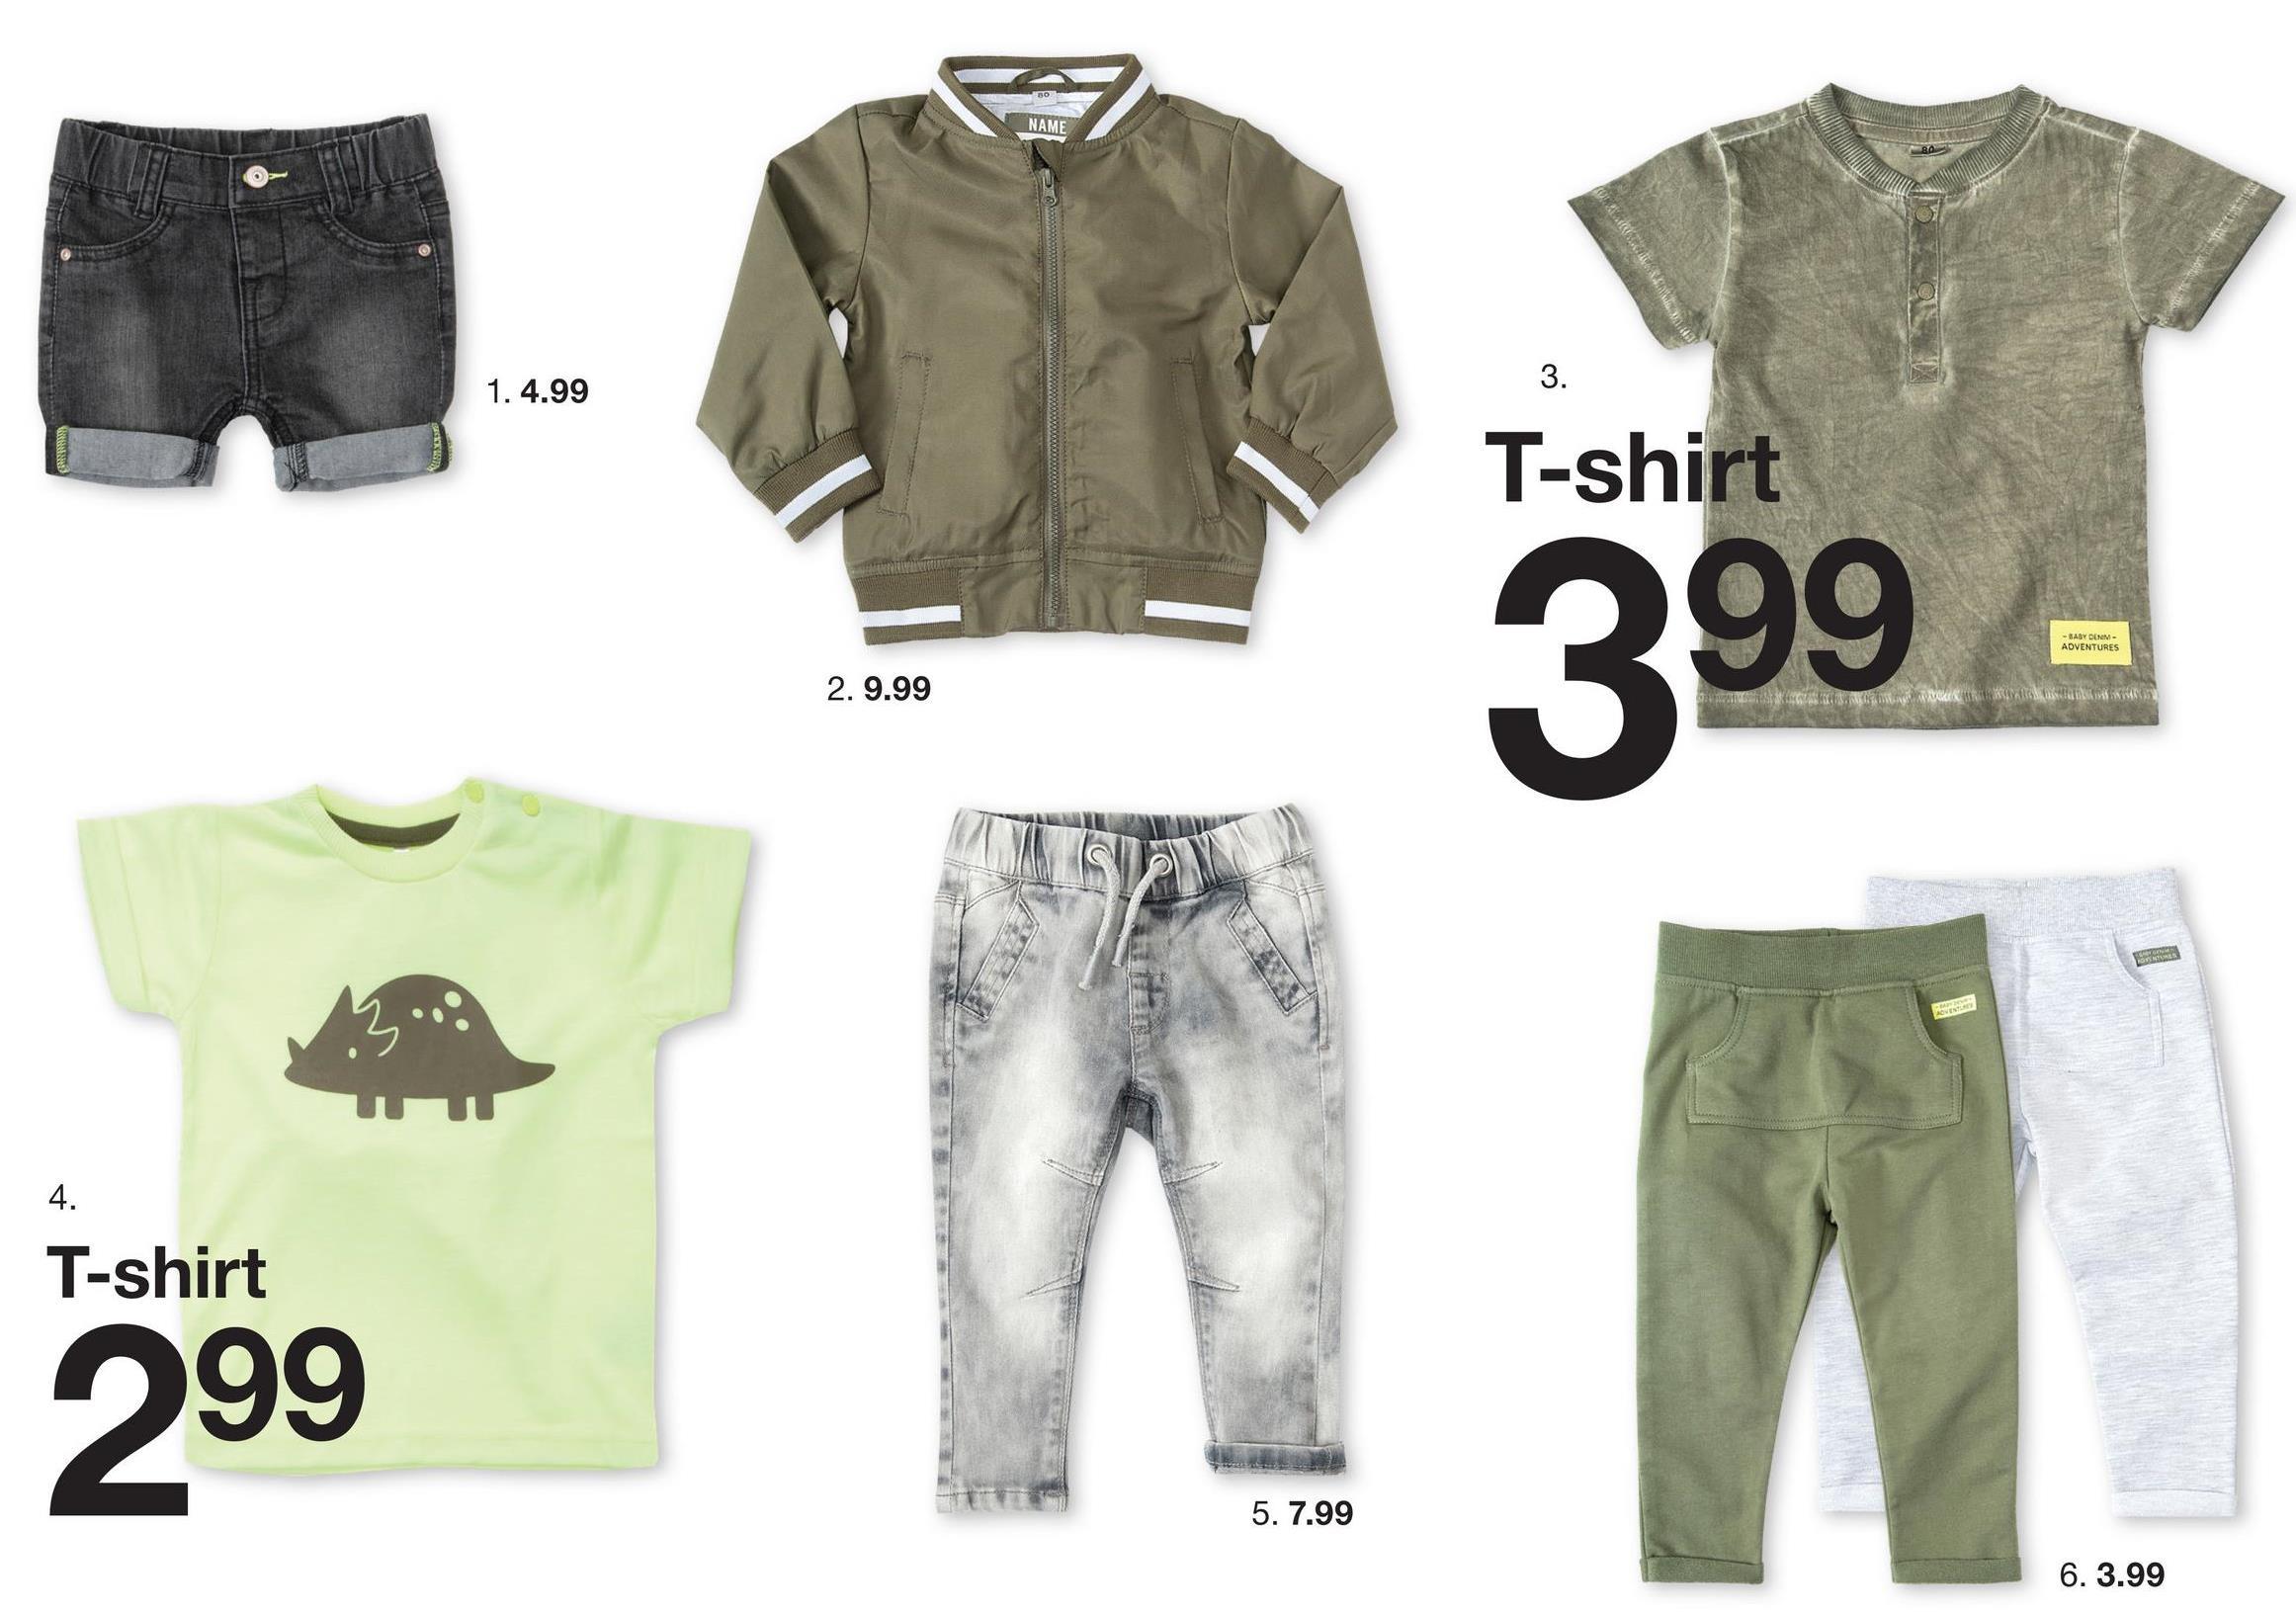 NAME AL 1.4.99 T-shirt 399 - - BABYDEN ADVENTURES 2. 9.99 PLATA KW - 4. T-shirt 299 5. 7.99 6. 3.99